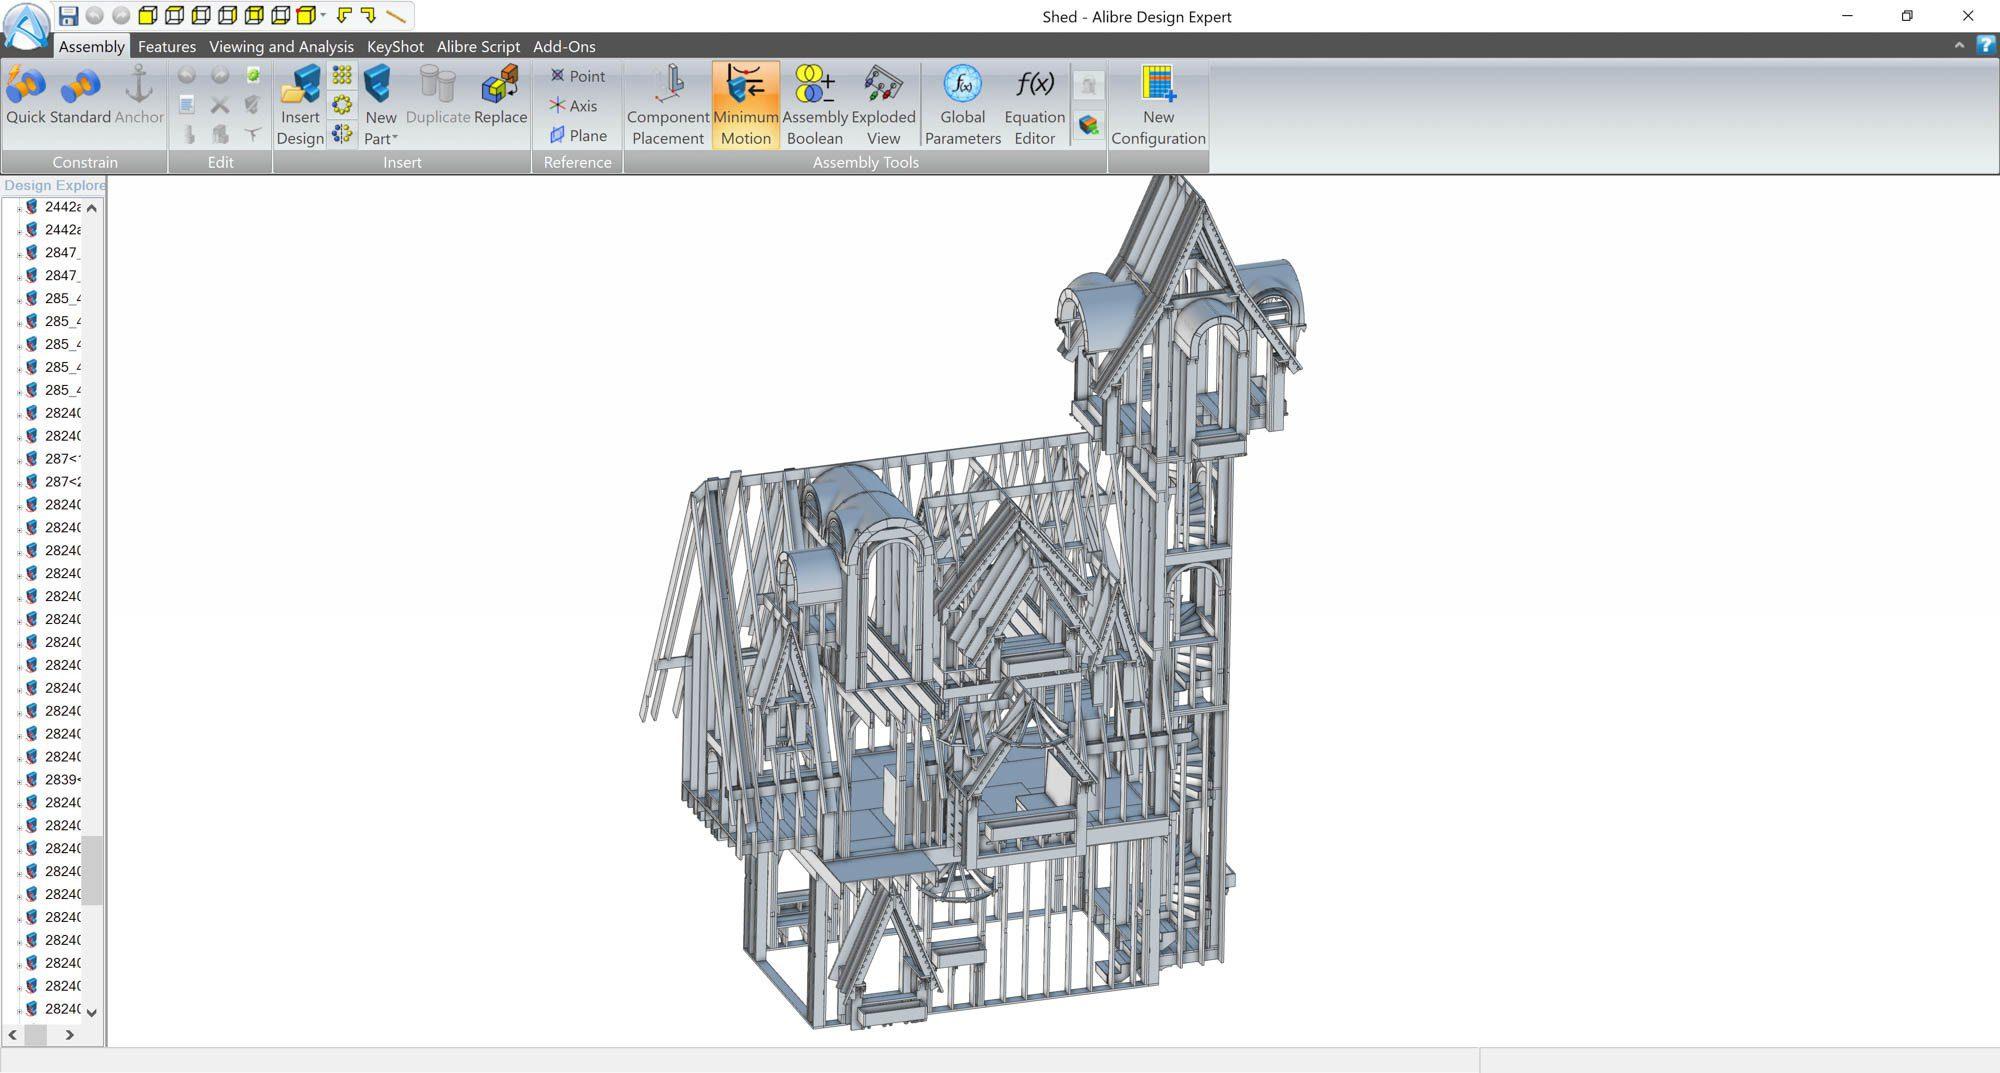 alibre-design-zrzut-ekranu-architektura-szkielet-domu-2